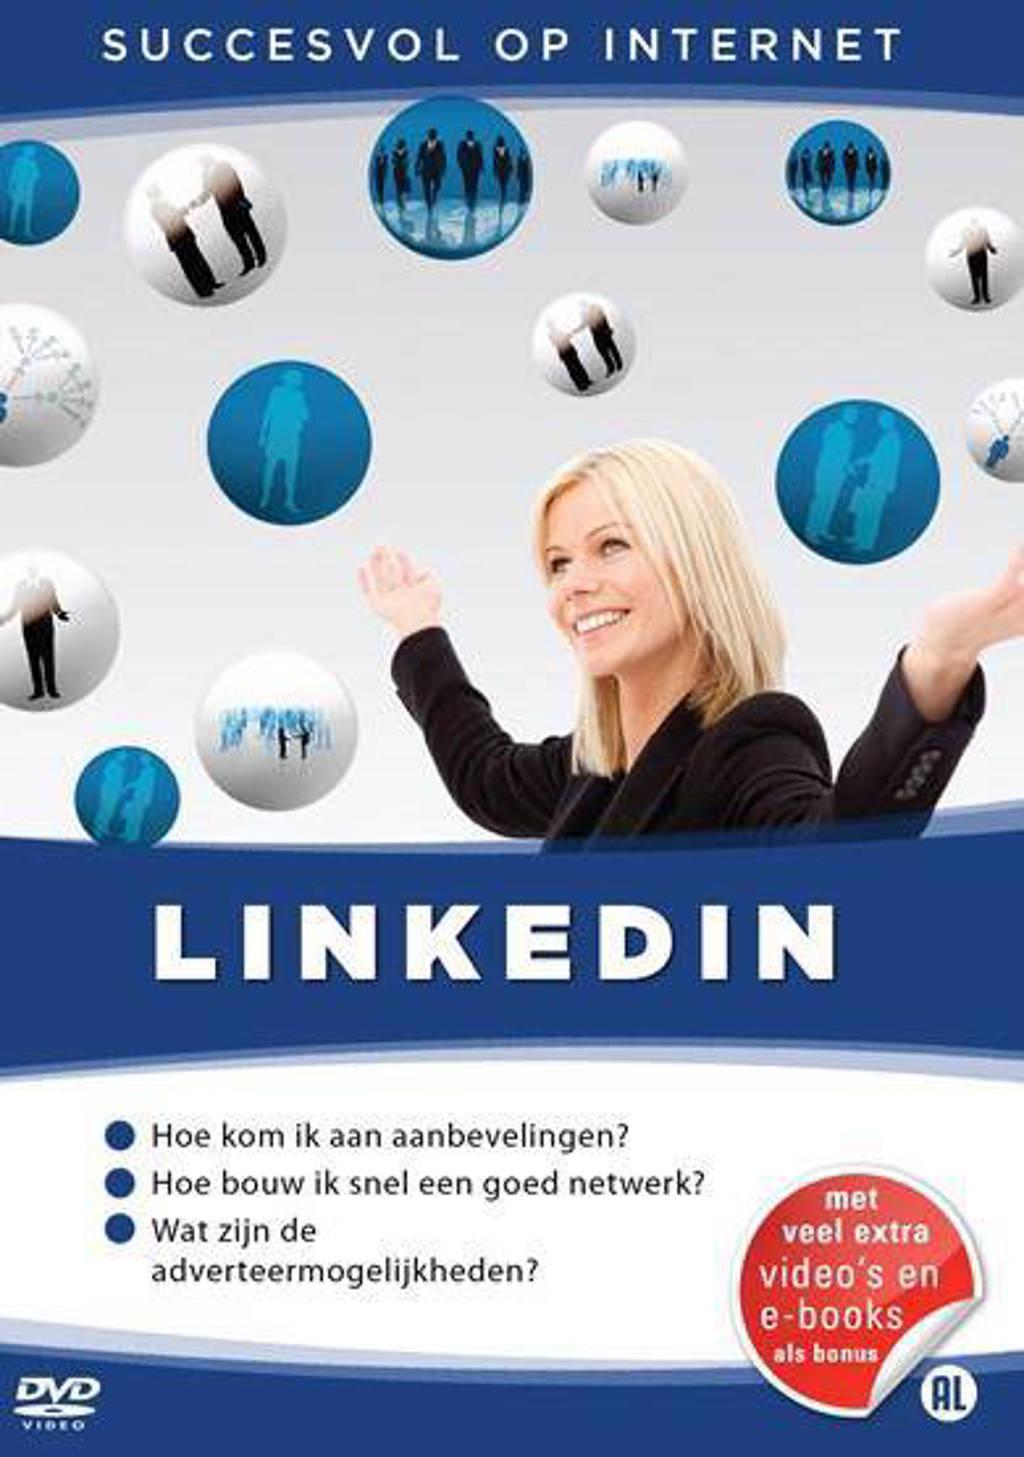 Succesvol op internet - Linkedin (DVD)